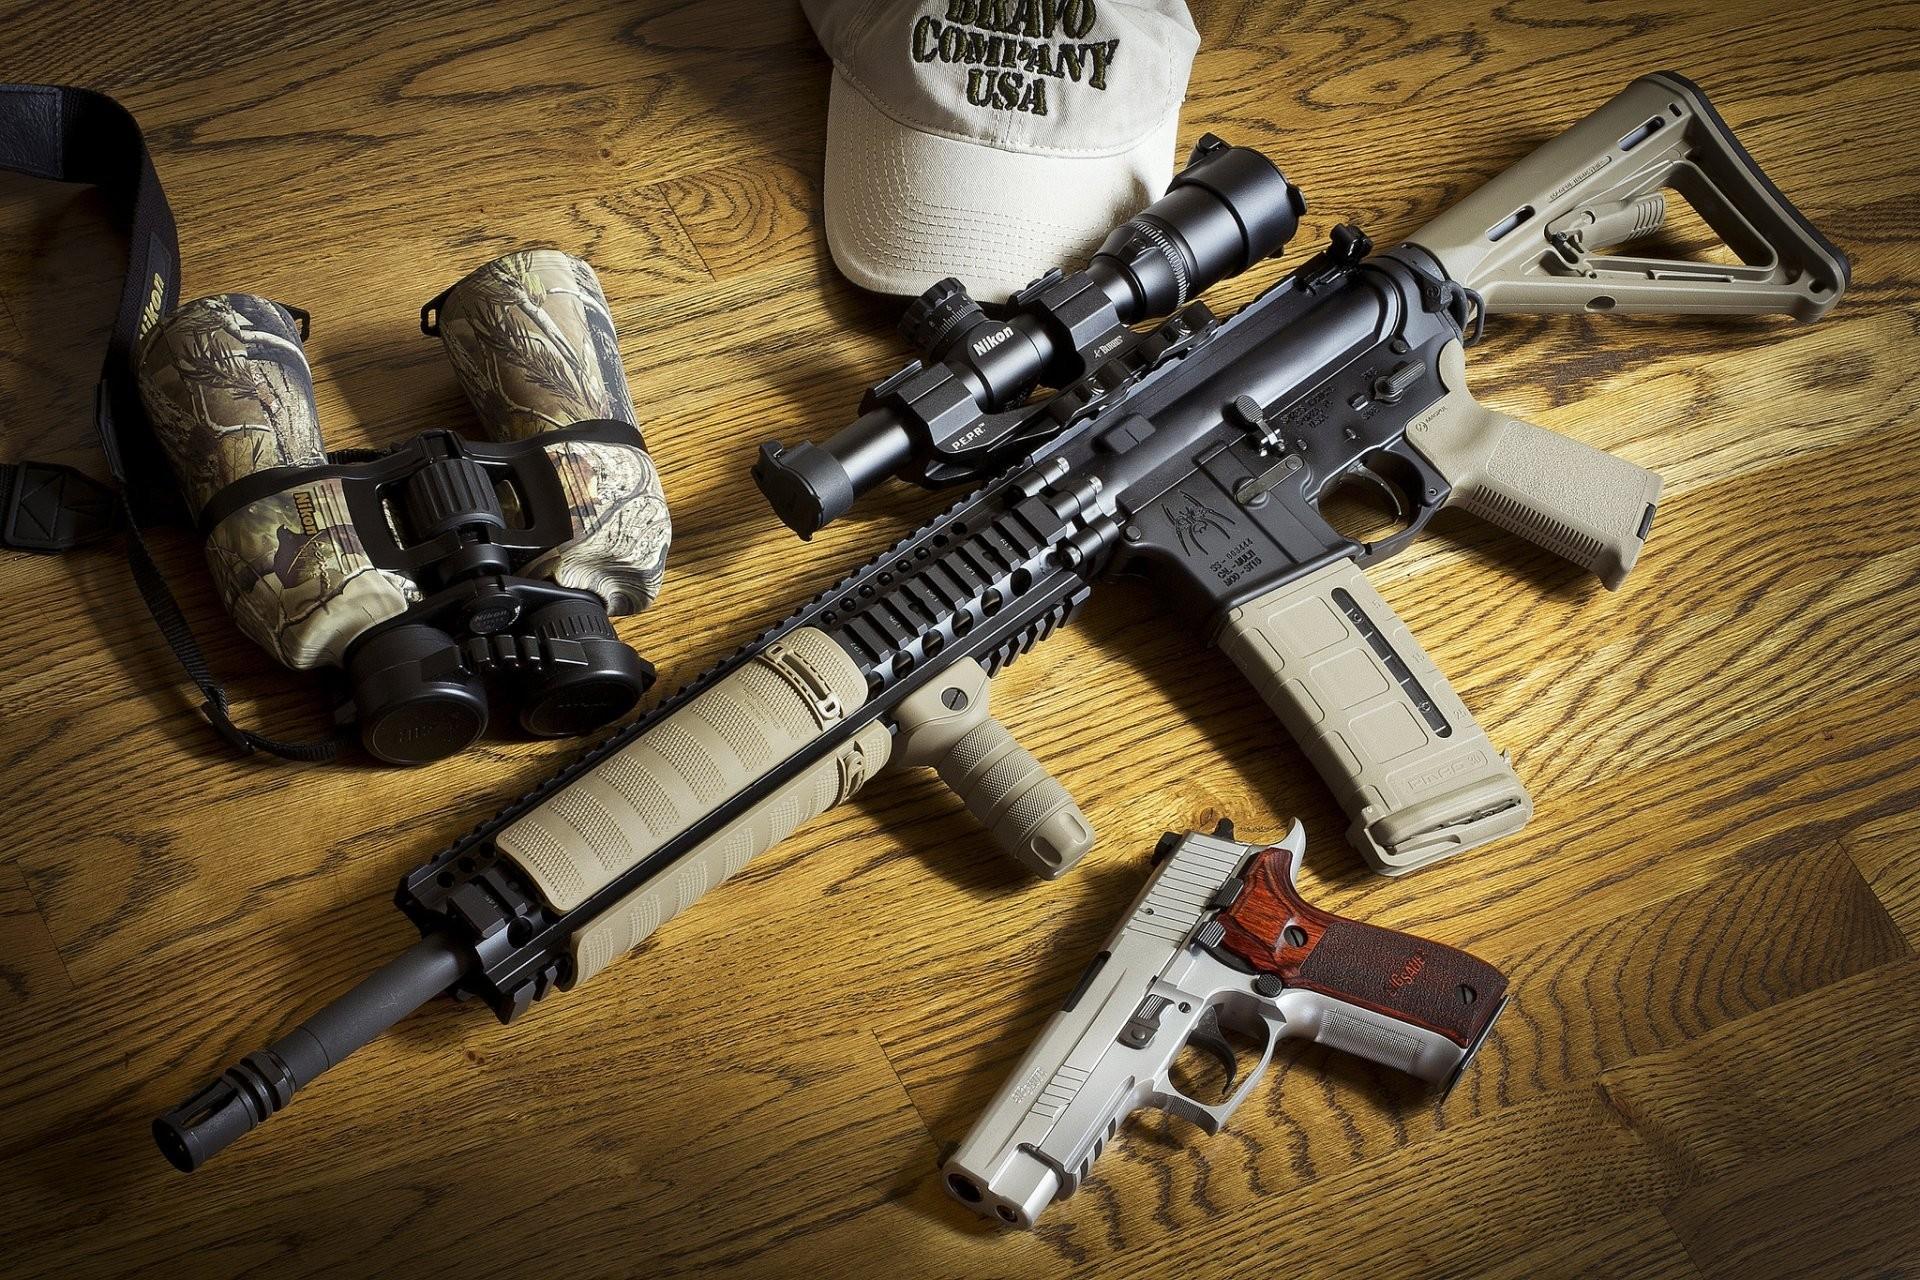 sig p226 gun ar-15 bcm assault rifle glasses weapon